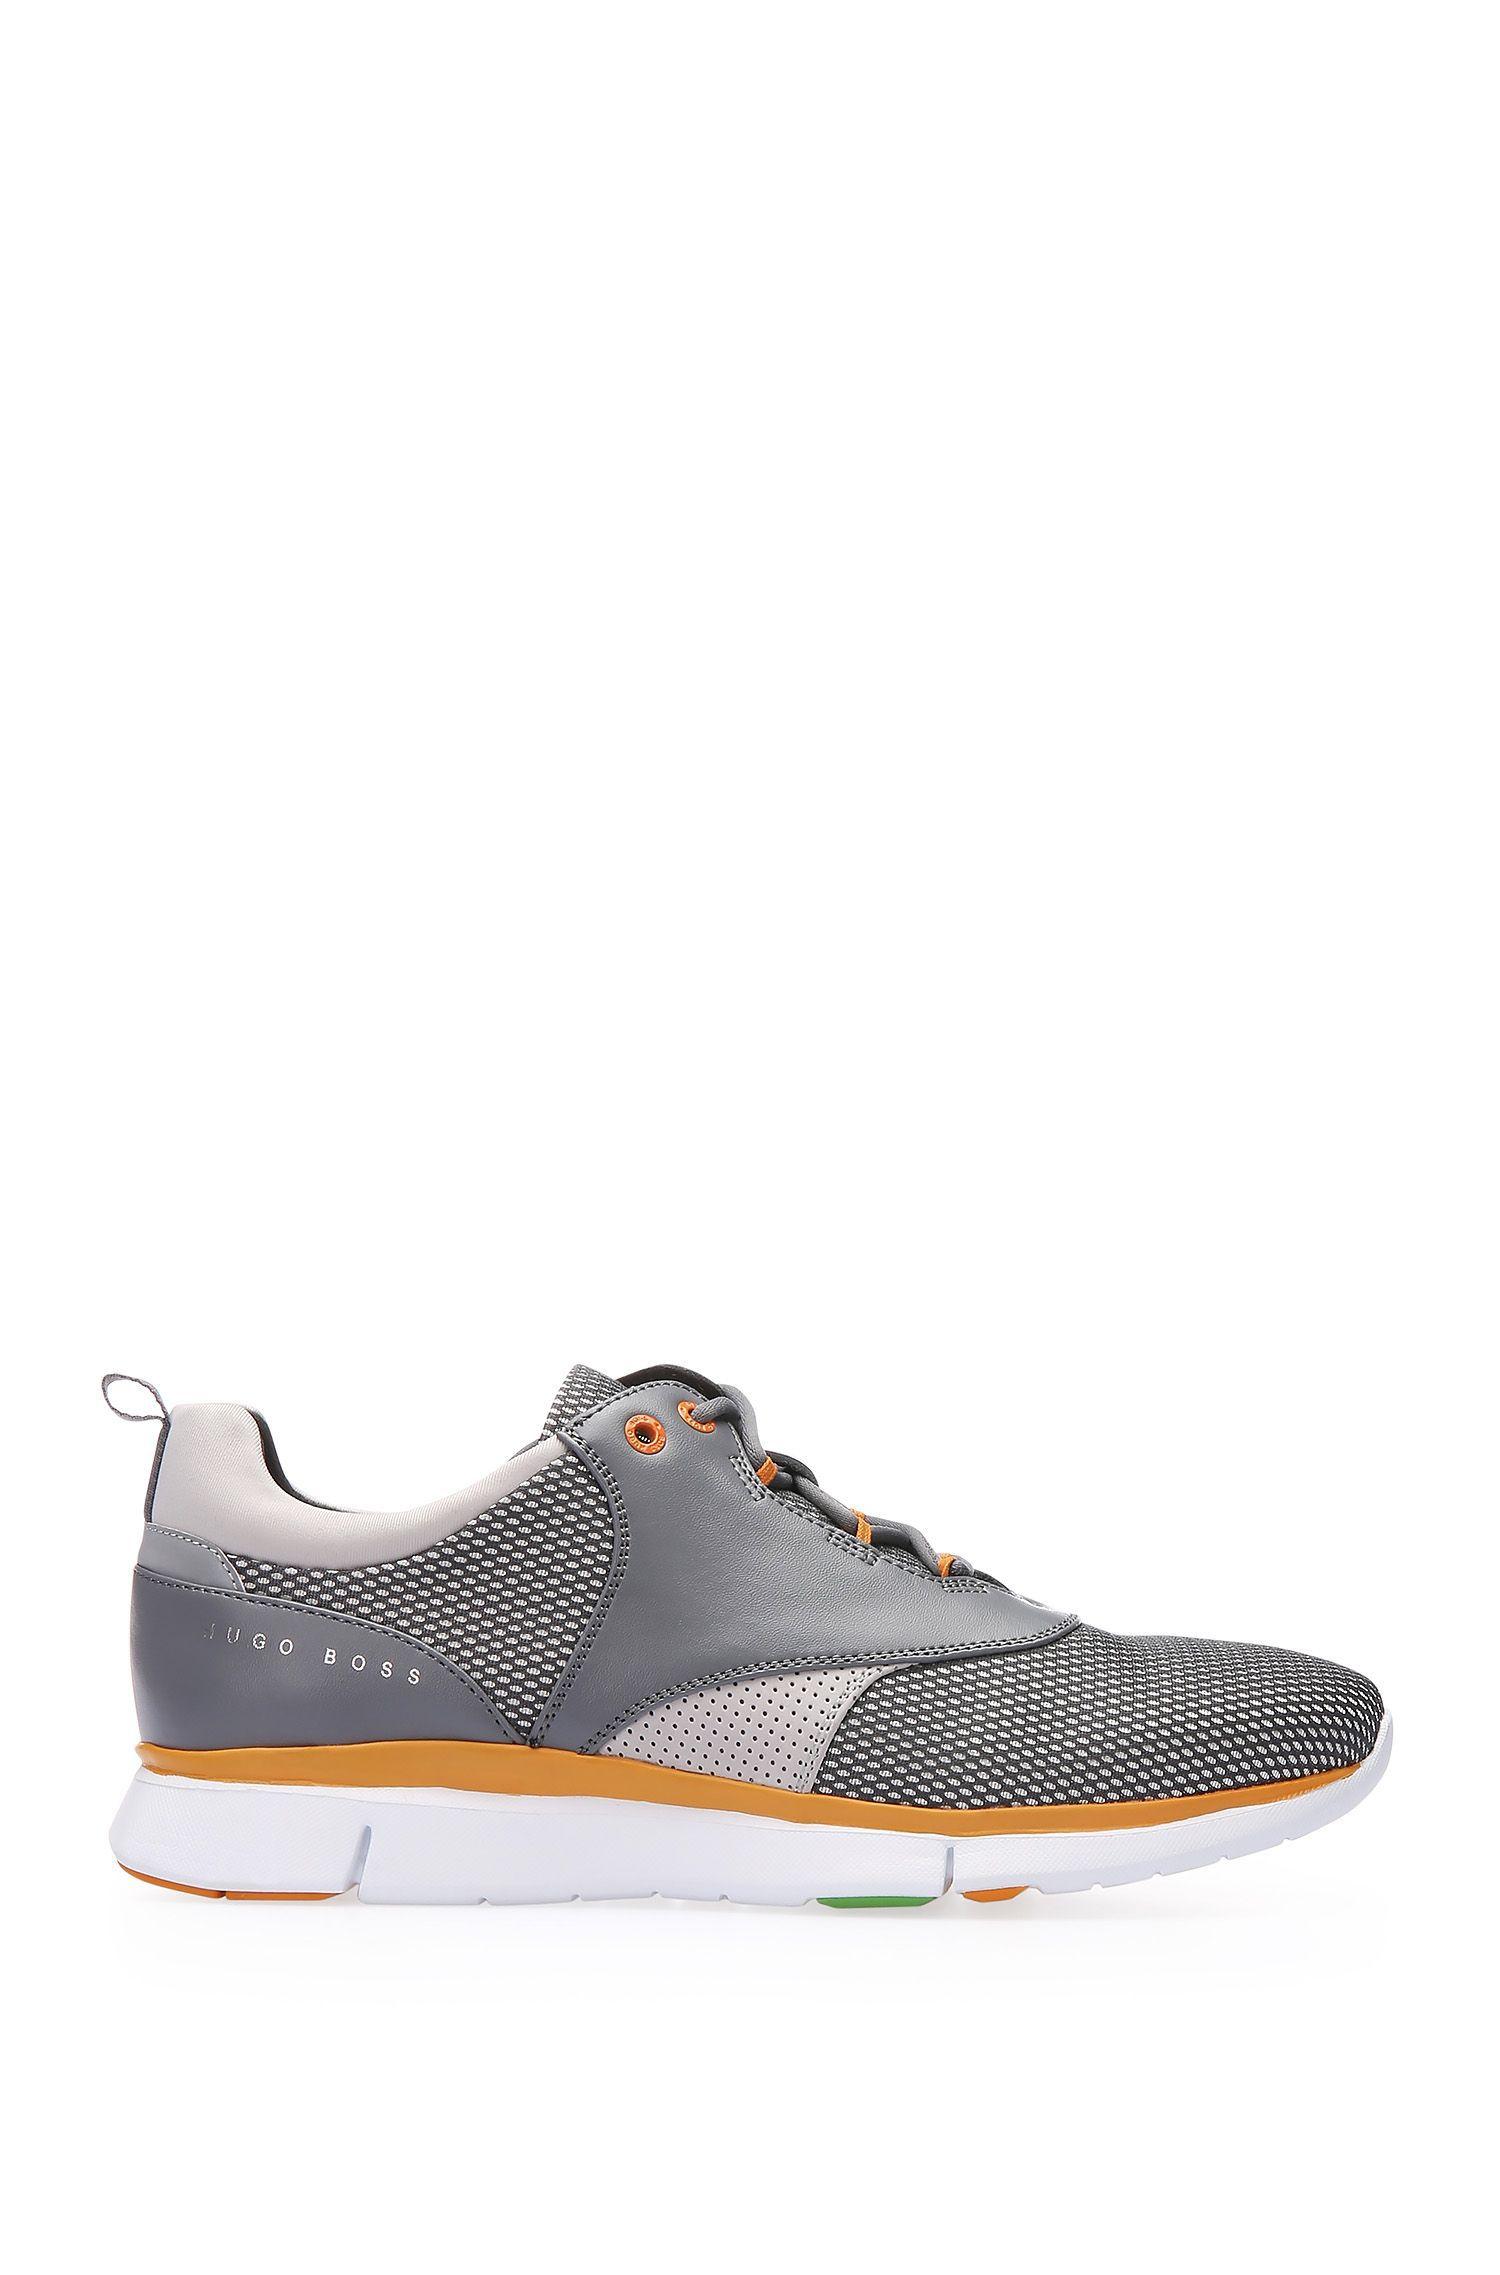 Sneakers aus Leder und Textil: ´GYM_Runn_nyme`